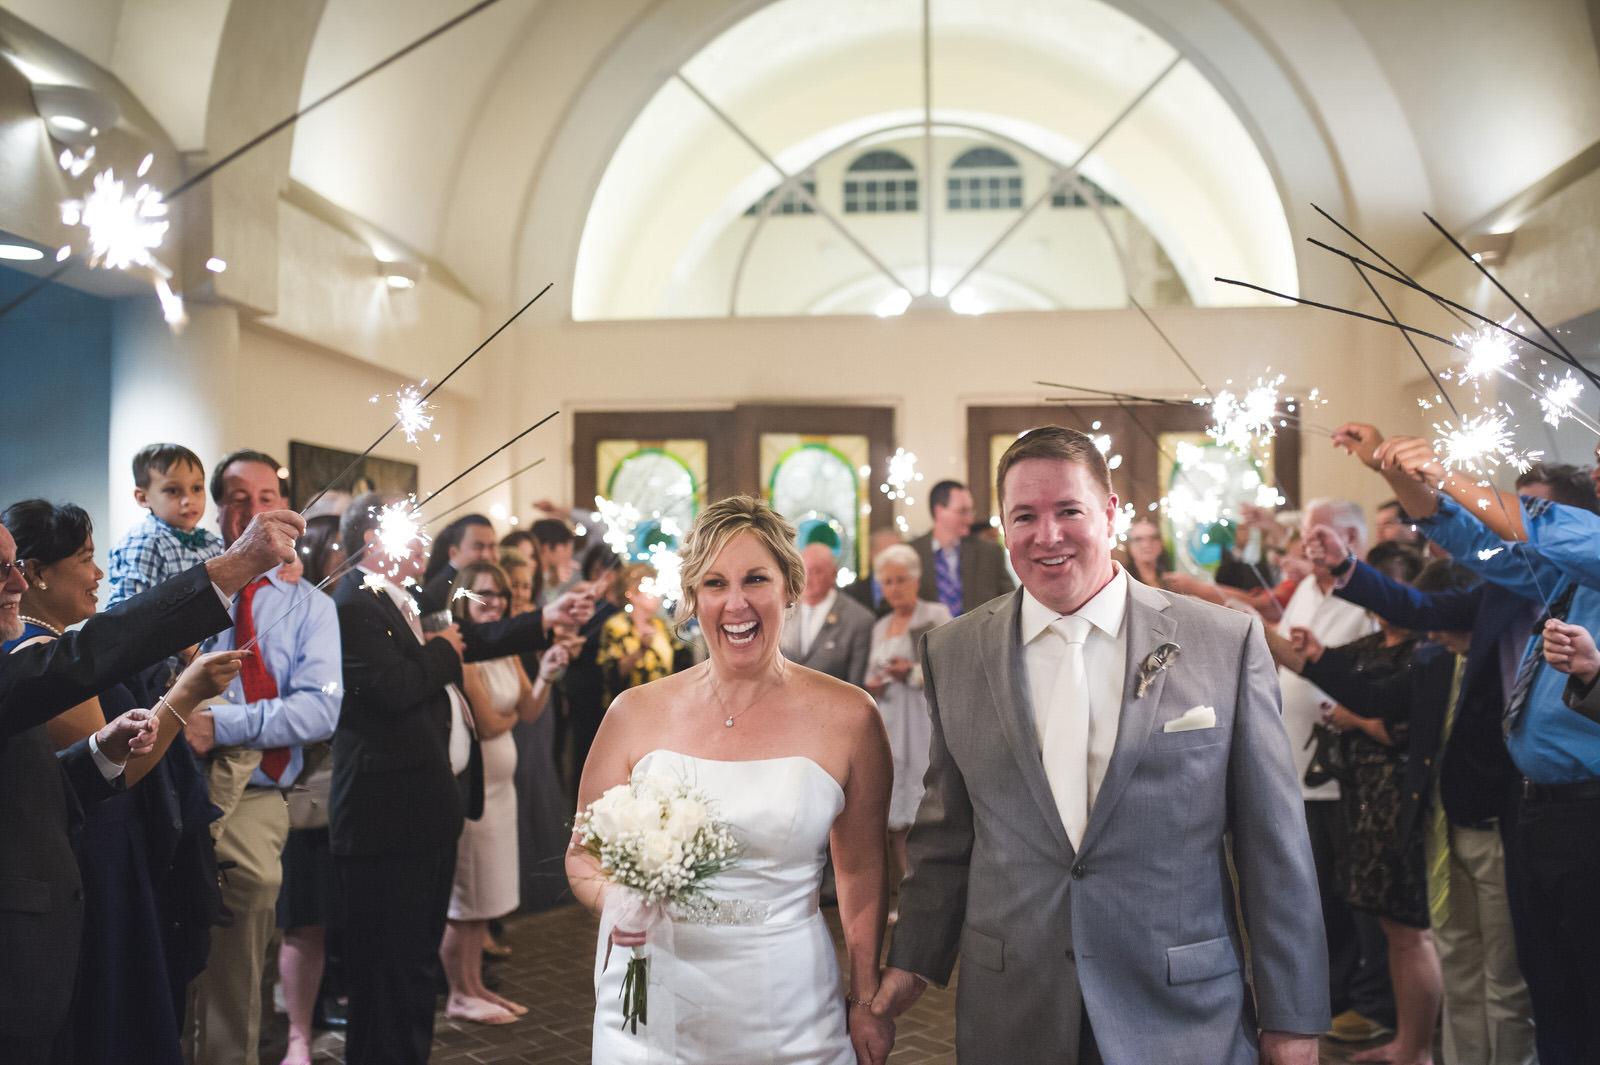 Mike_&_Barbaras_Wedding_3_24_2018-501.jpg